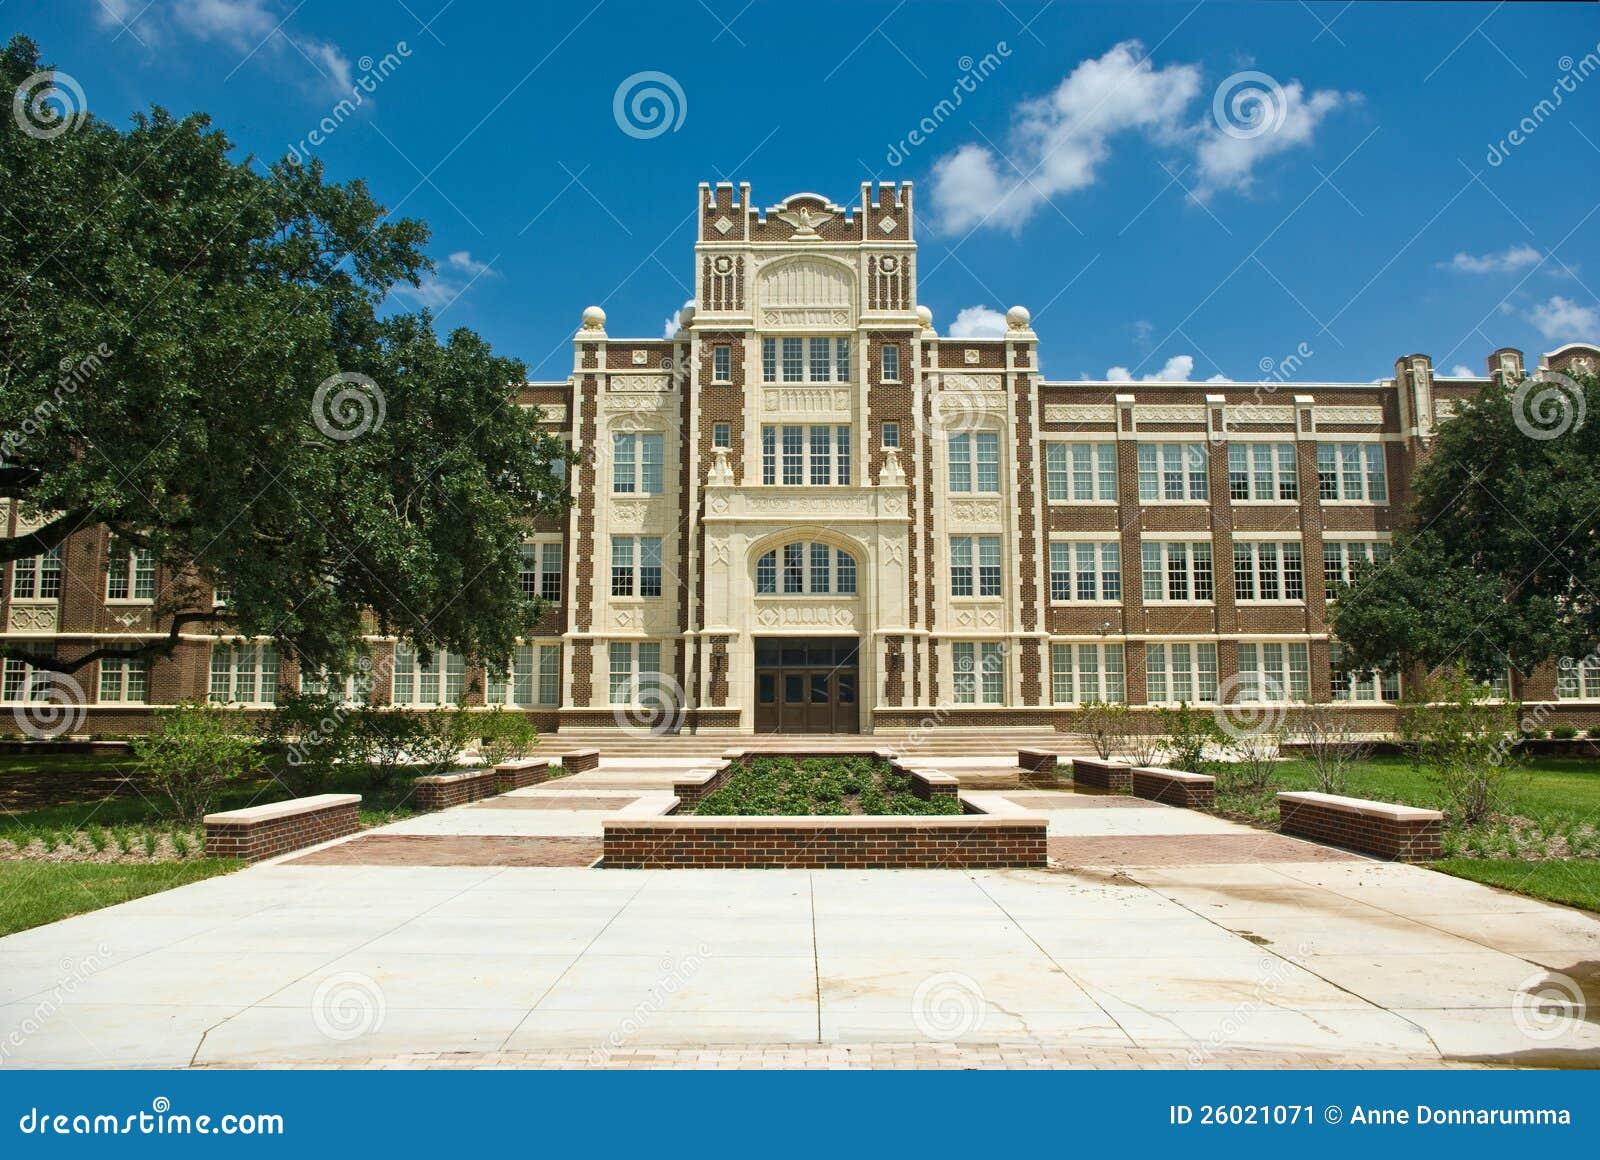 Lee Magnet High School- Baton Rouge, Louisiana